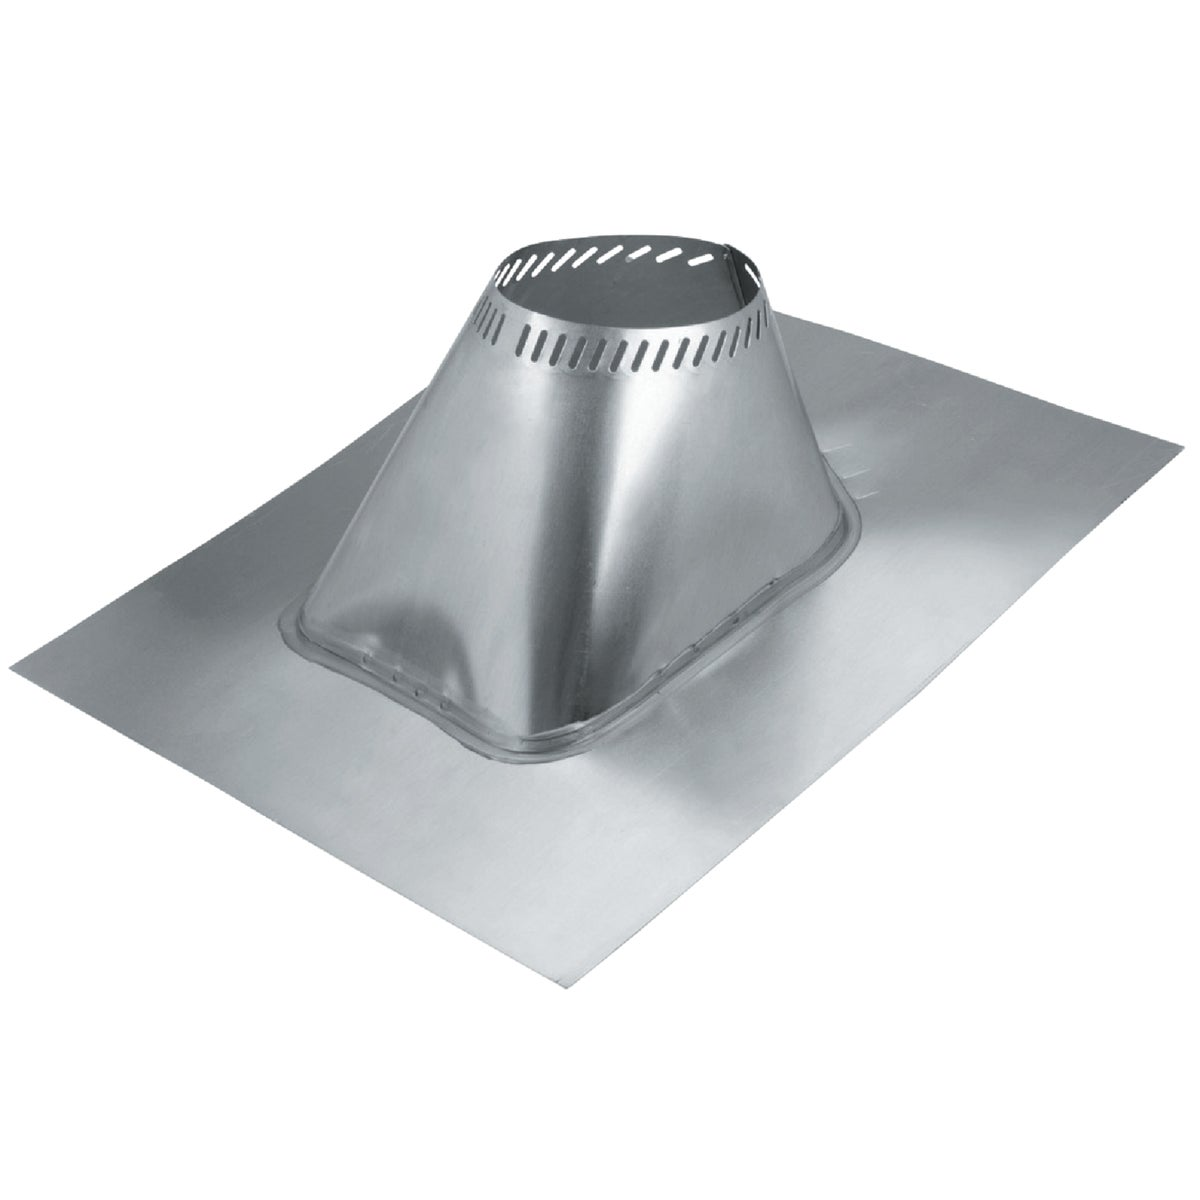 Adjustable Roof Flashing